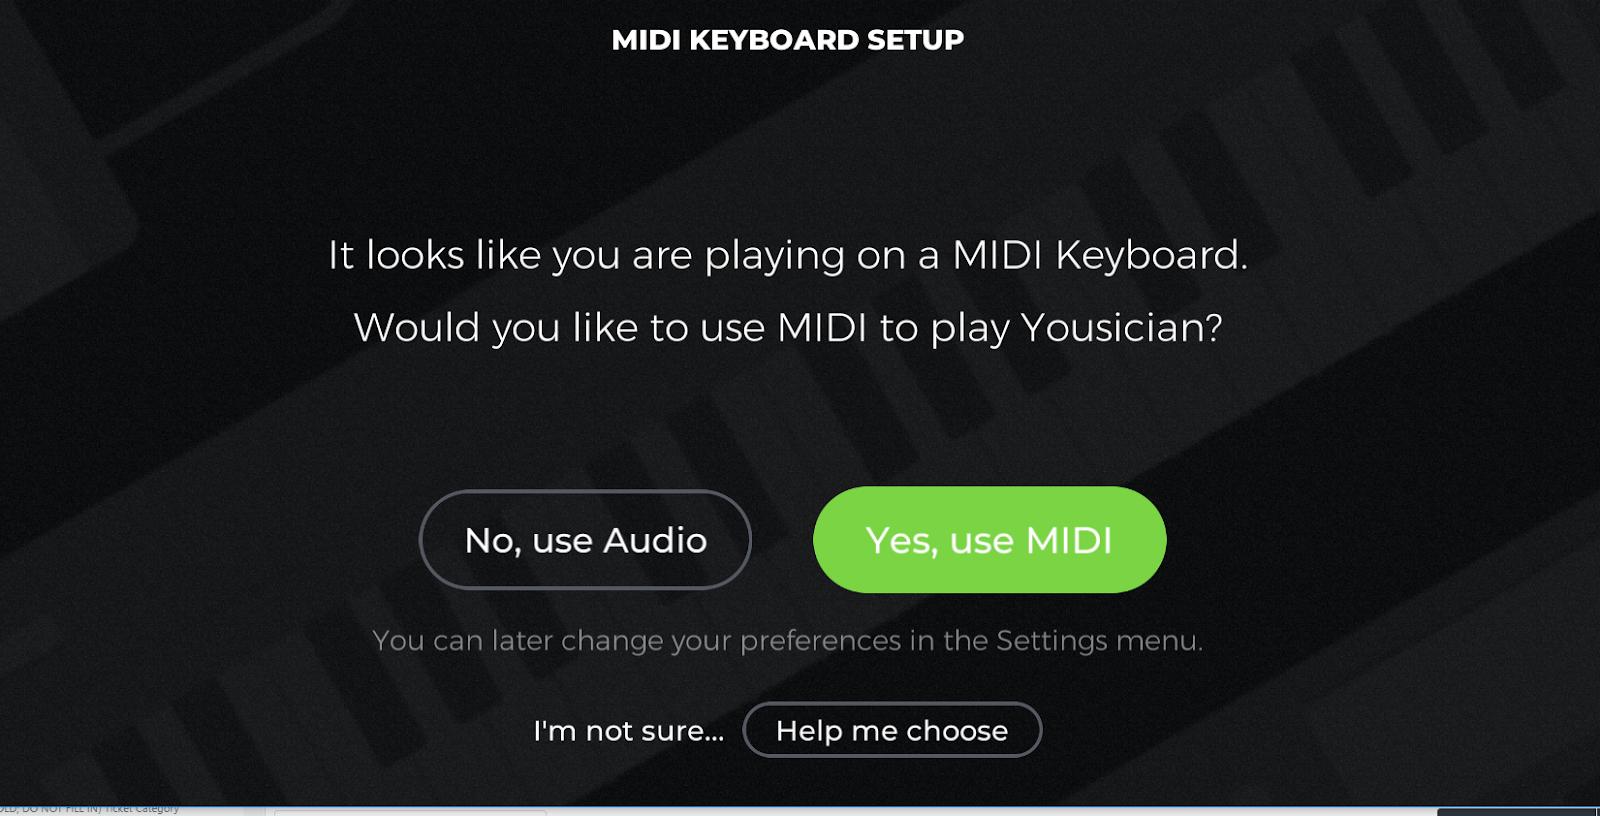 MIDI__1_.png